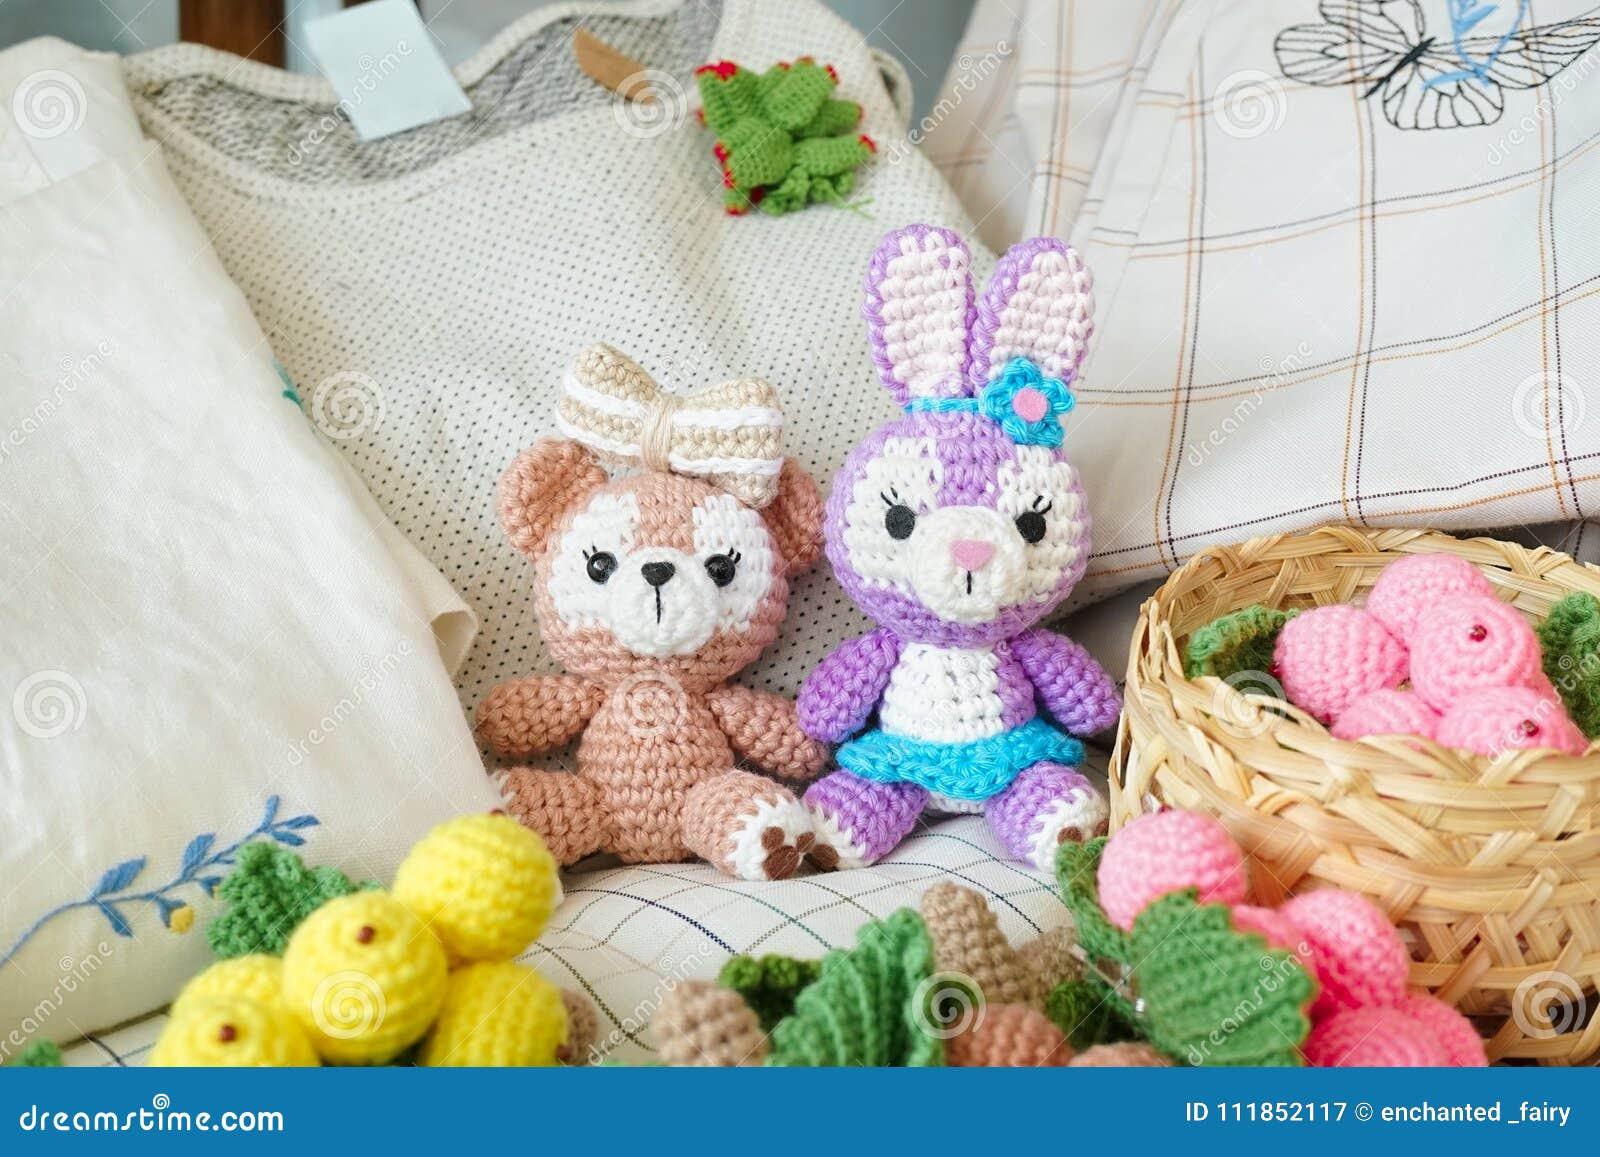 Easter bunny egg crochet pattern - Amigurumi Today | 957x1300